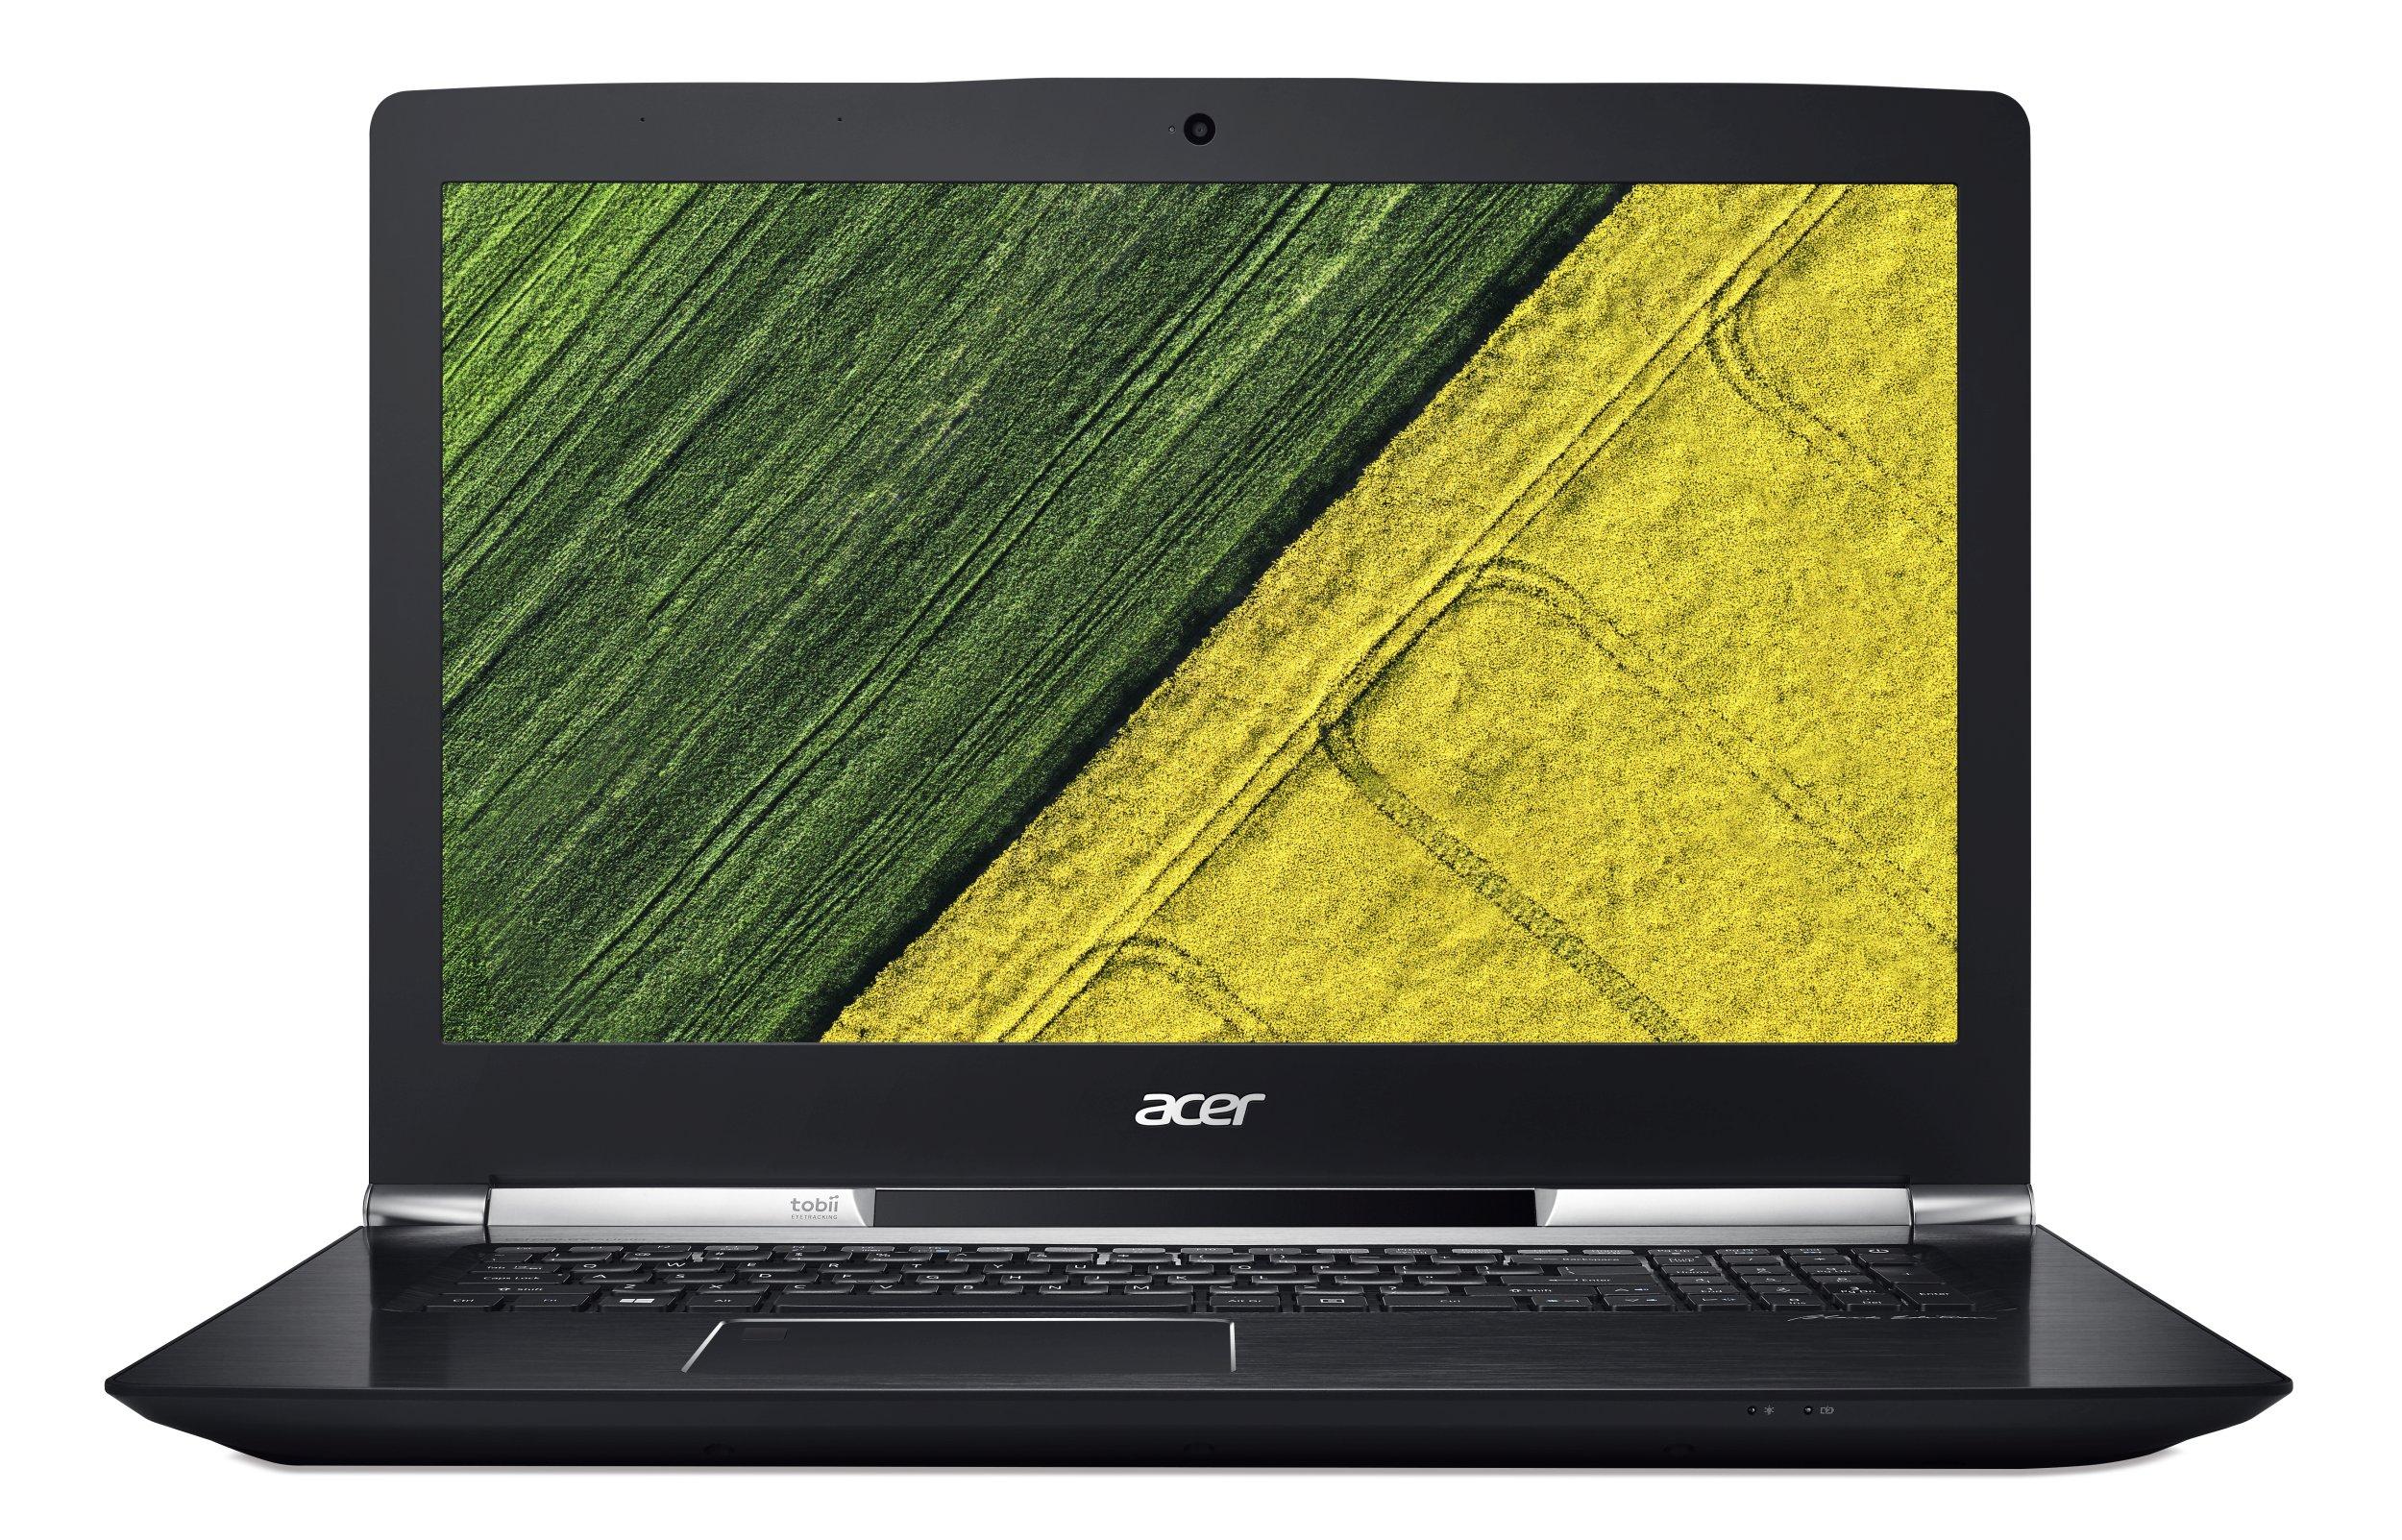 "Acer Aspire V17 Nitro (VN7-793G-71UV) i7-7700HQ/8GB+8GB/256GB SSD+1TB/GTX 1060 6GB/17.3"" FHD IPS matný/BT/W10 Home/Black"